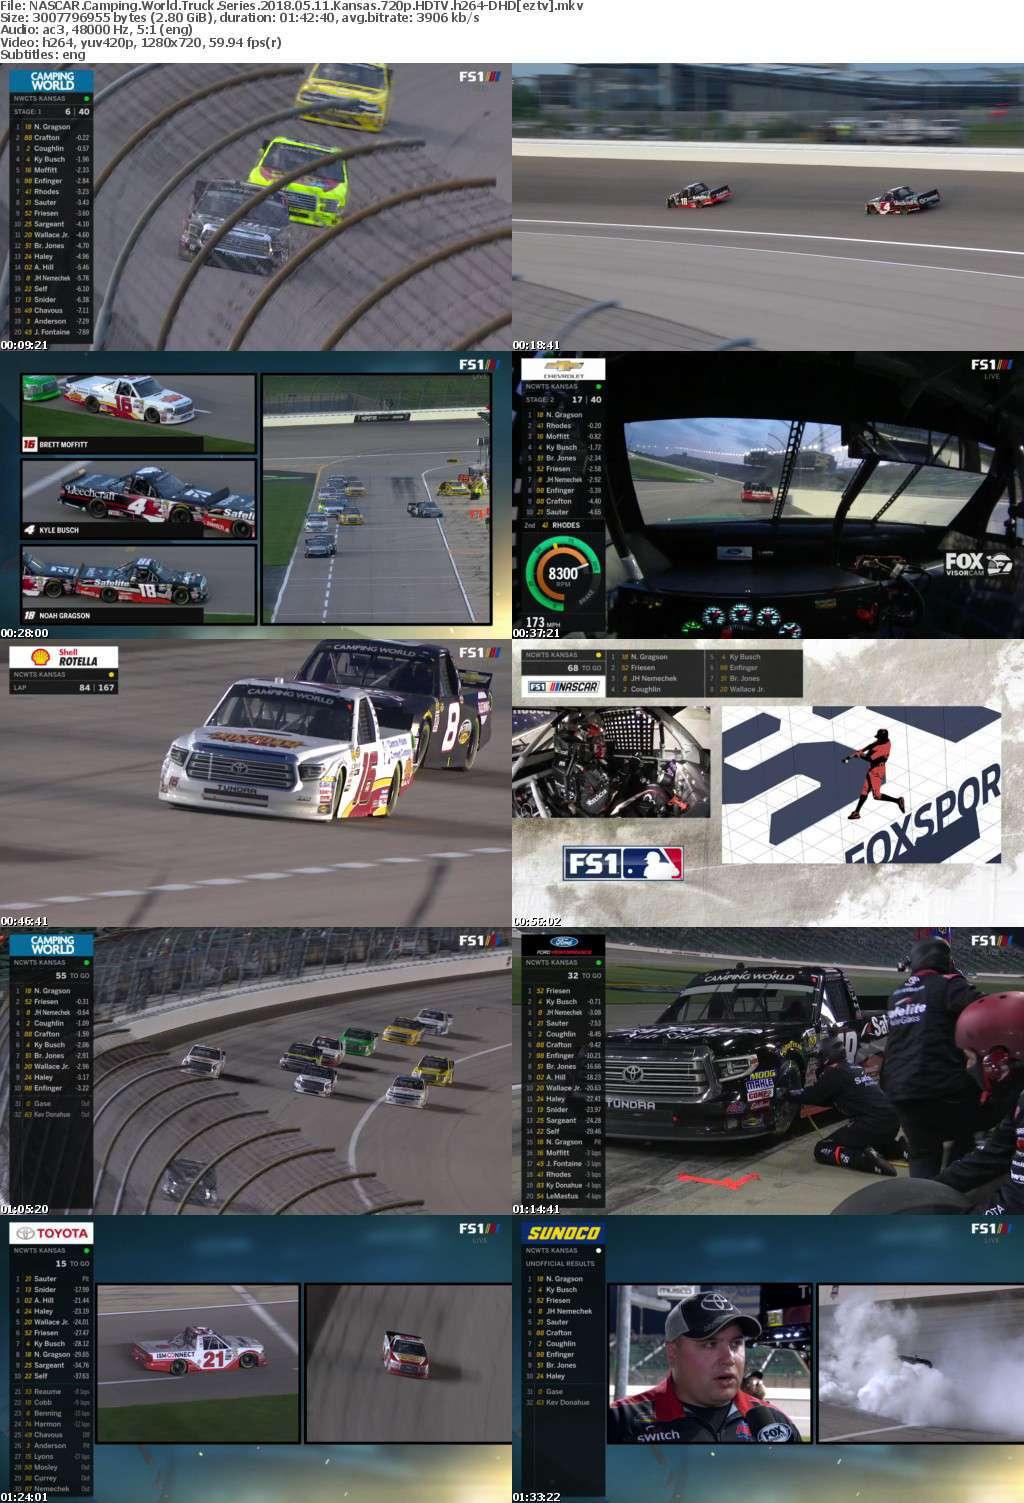 NASCAR Camping World Truck Series 2018 05 11 Kansas 720p HDTV h264-DHD